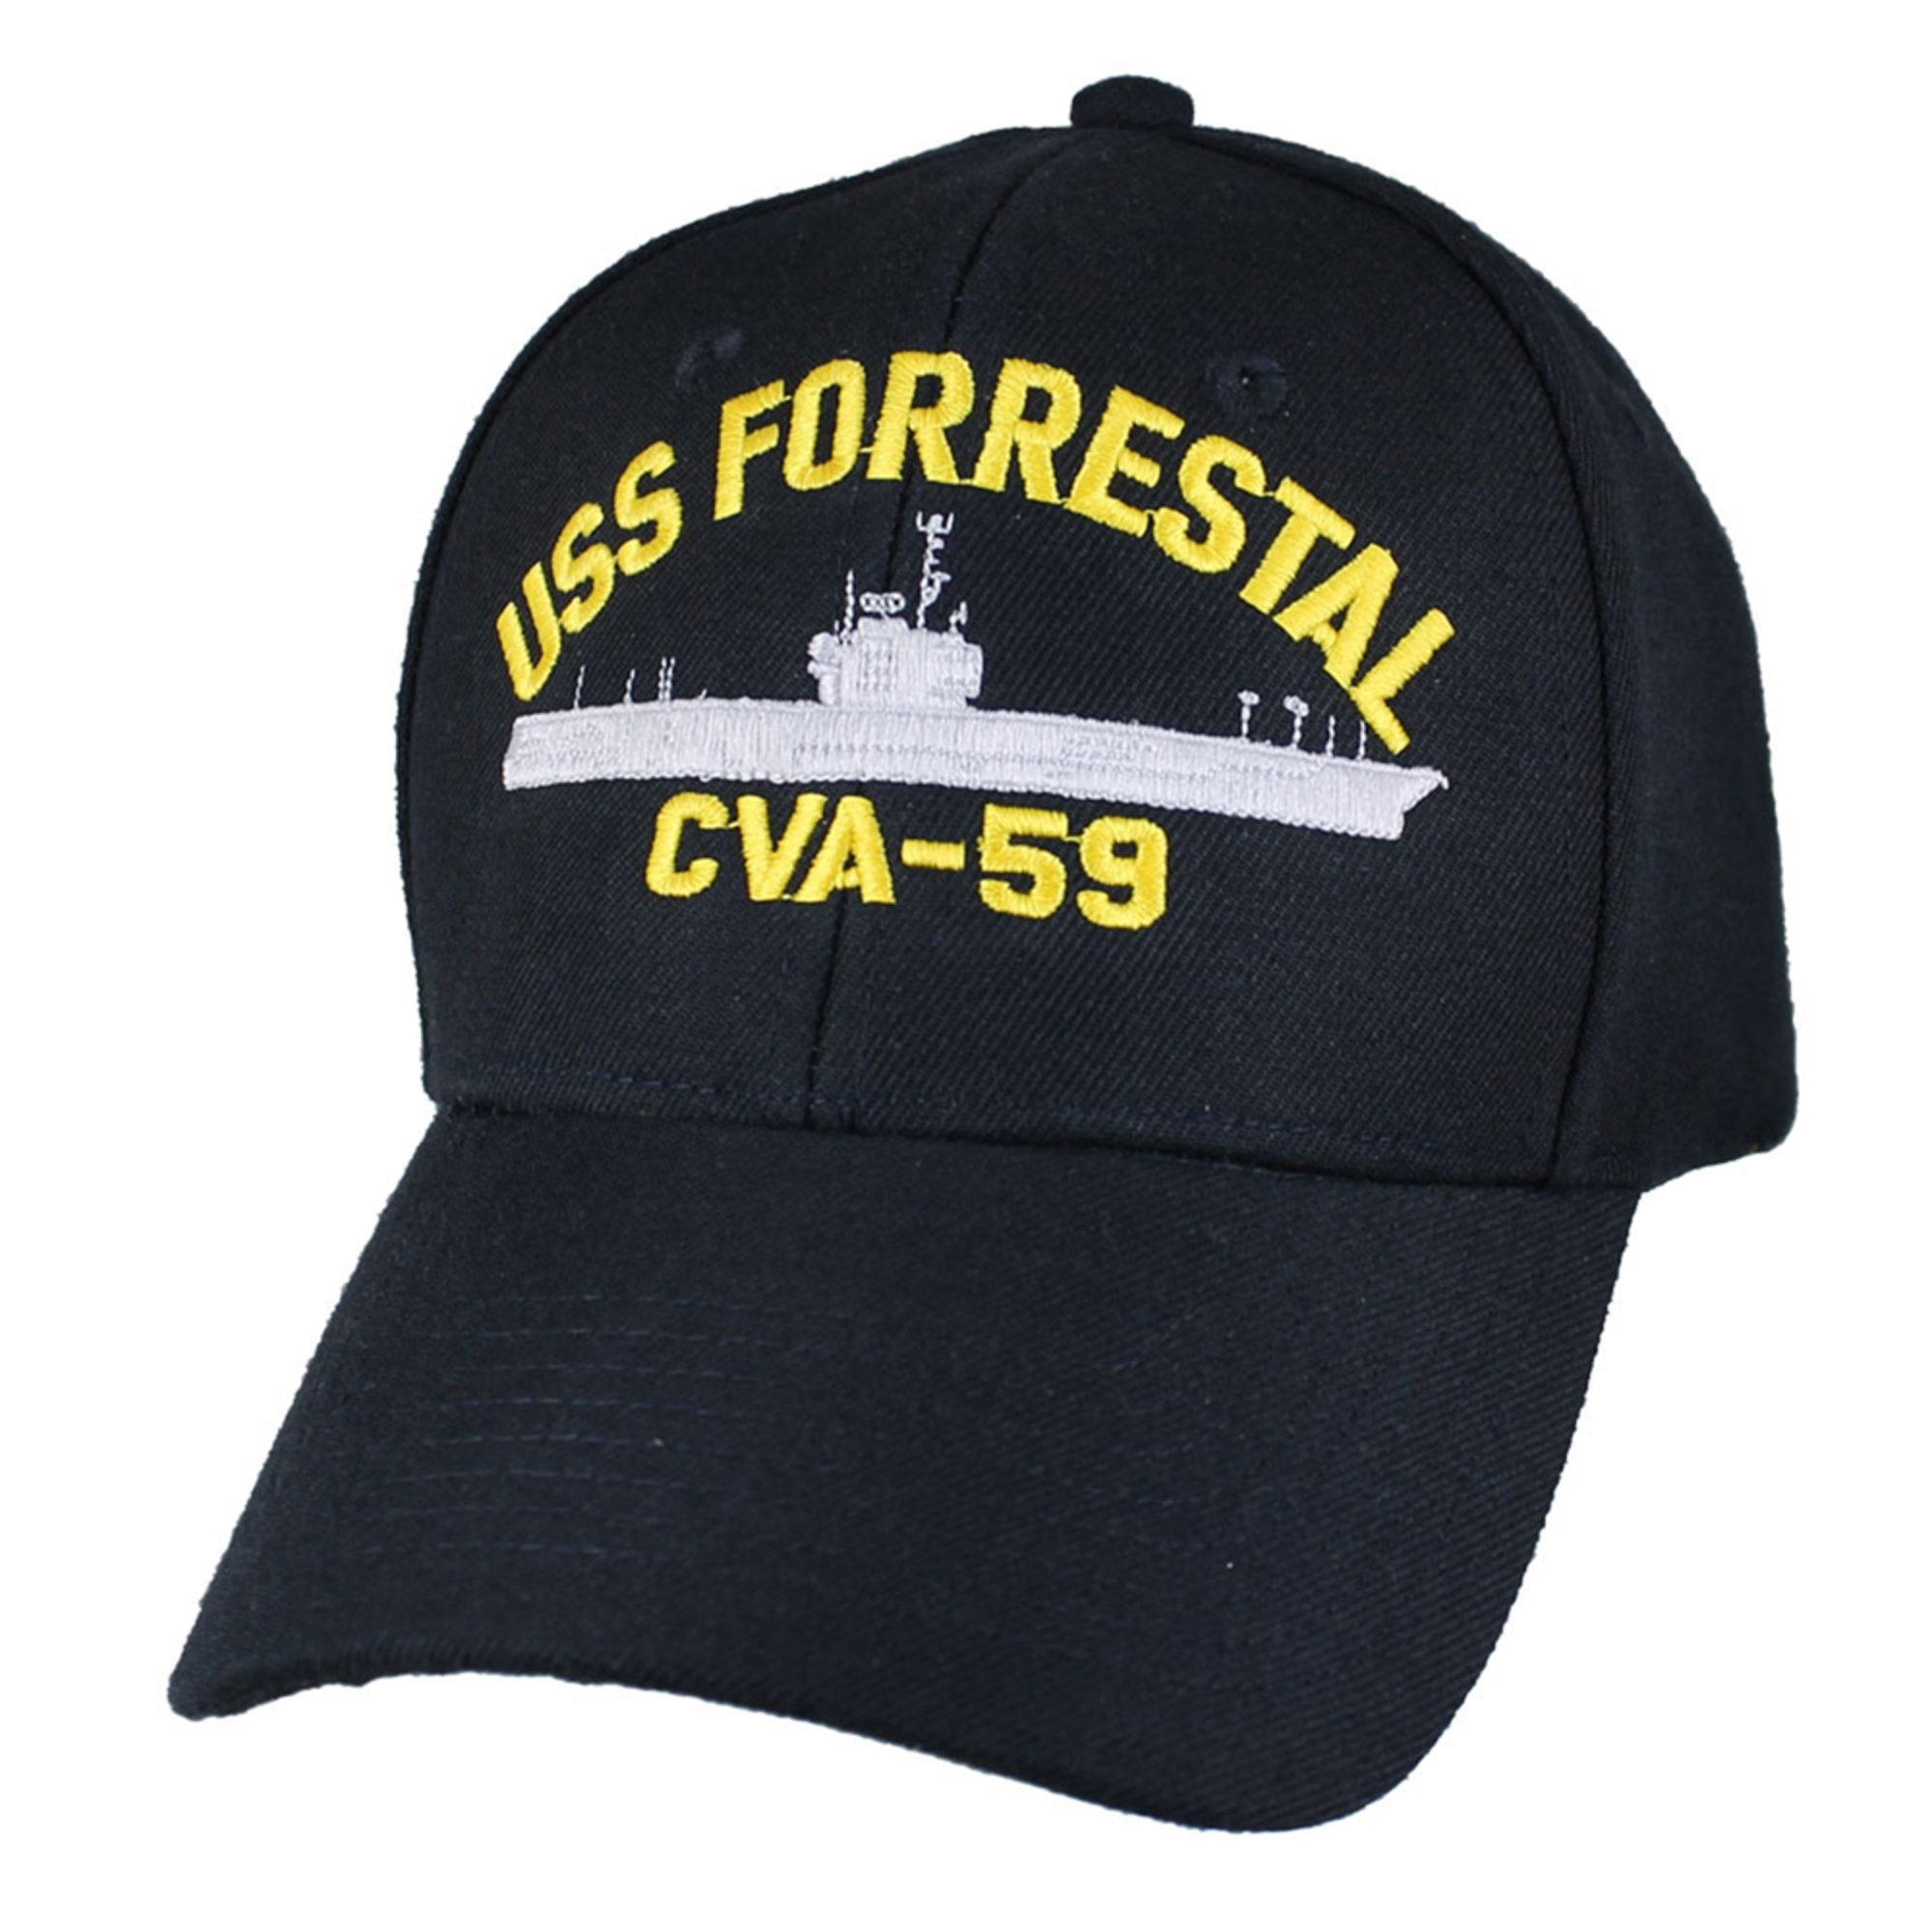 Eagle Crest Men s Uss Forrestal Cva-59 Decommissioned Carrier Hat ... 427b21fb891